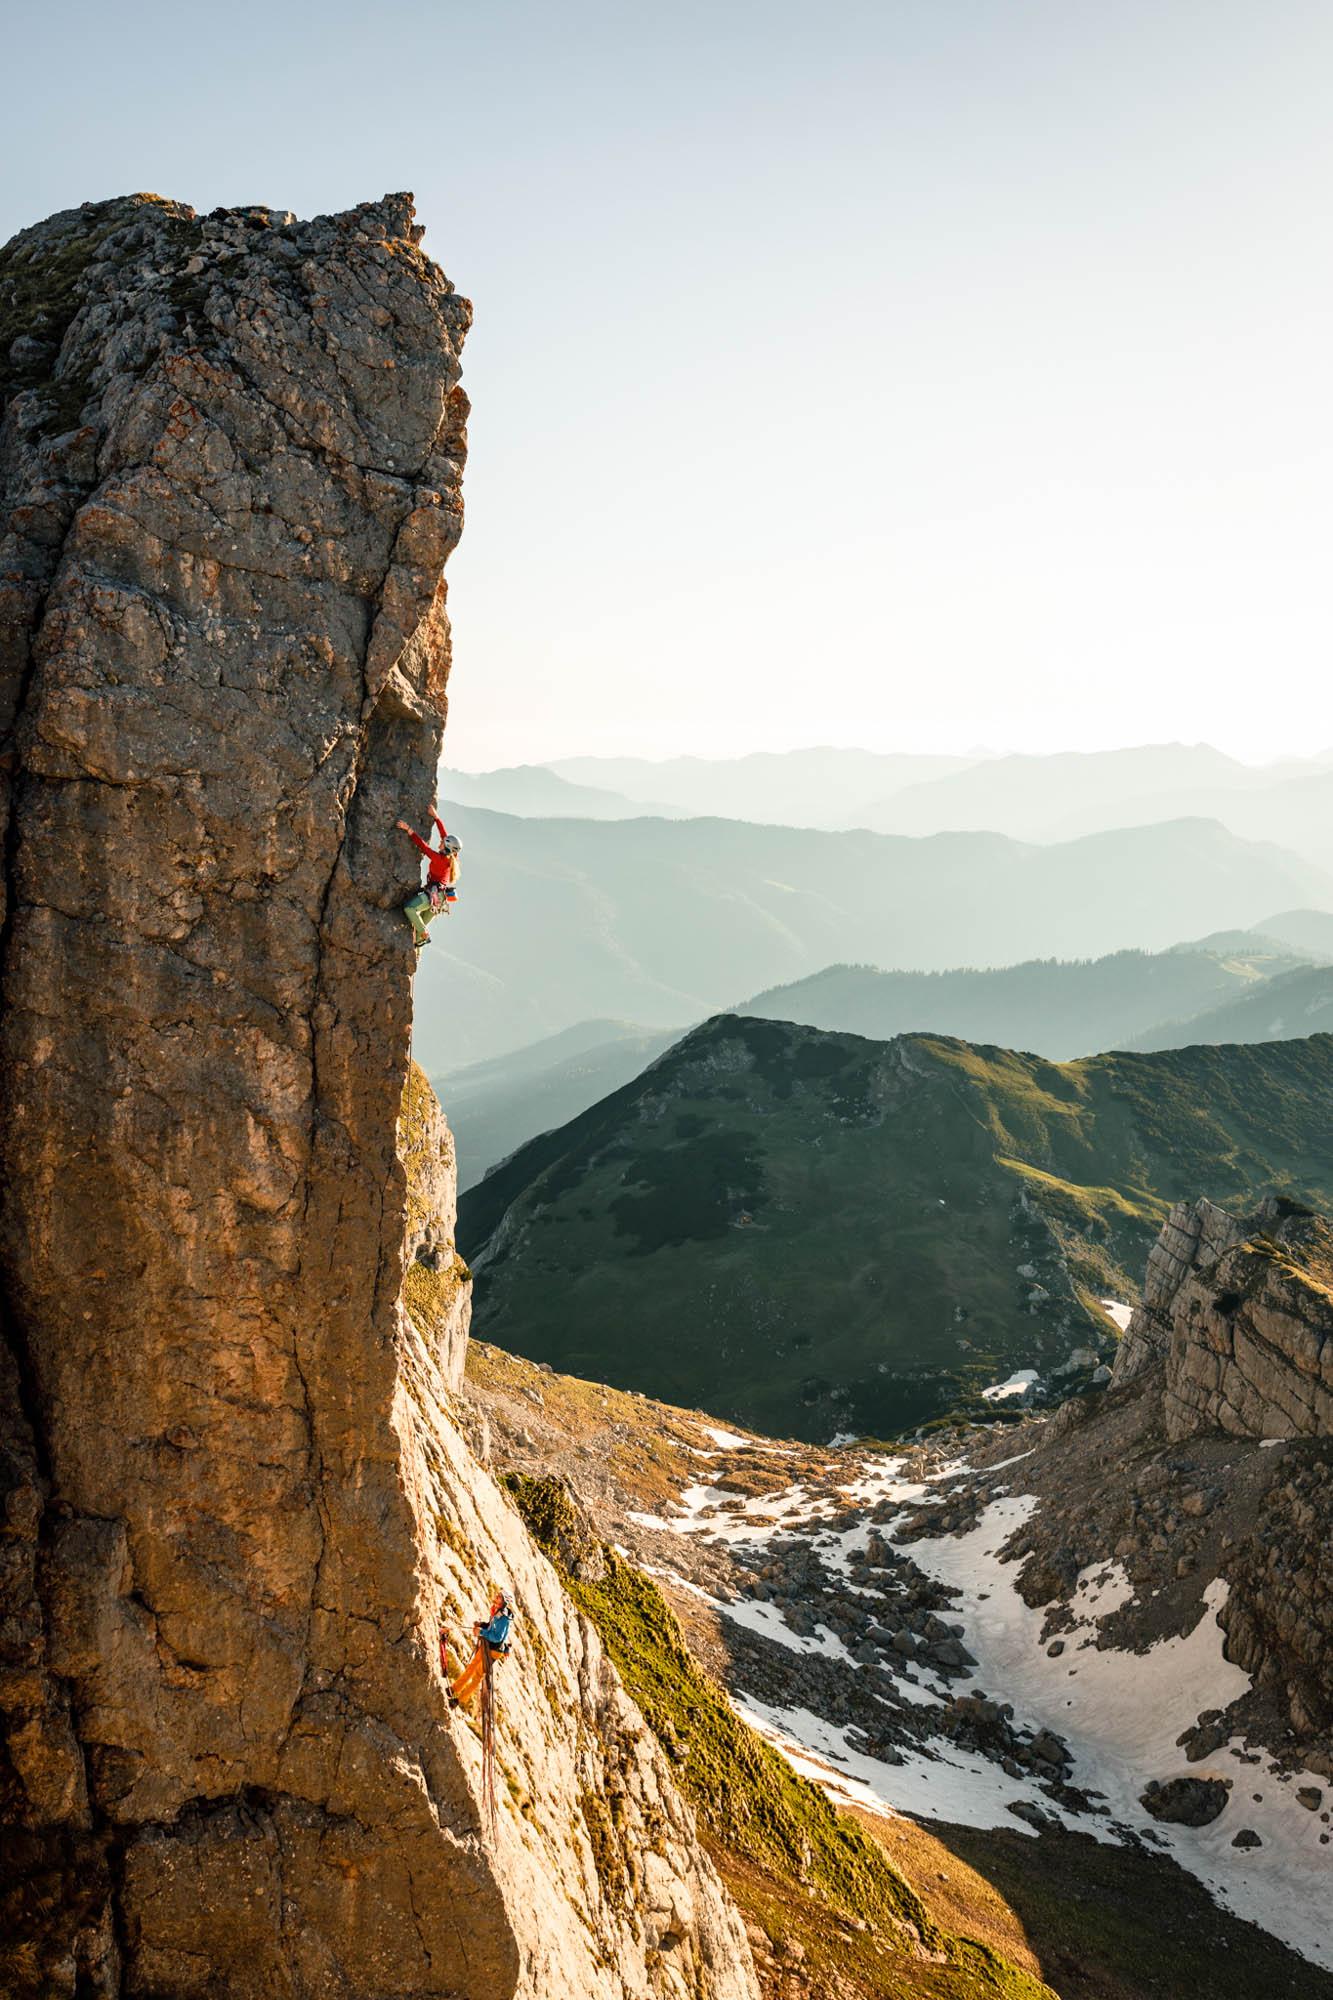 Klettershooting in den Tiroler Bergen © Maximilian Draeger